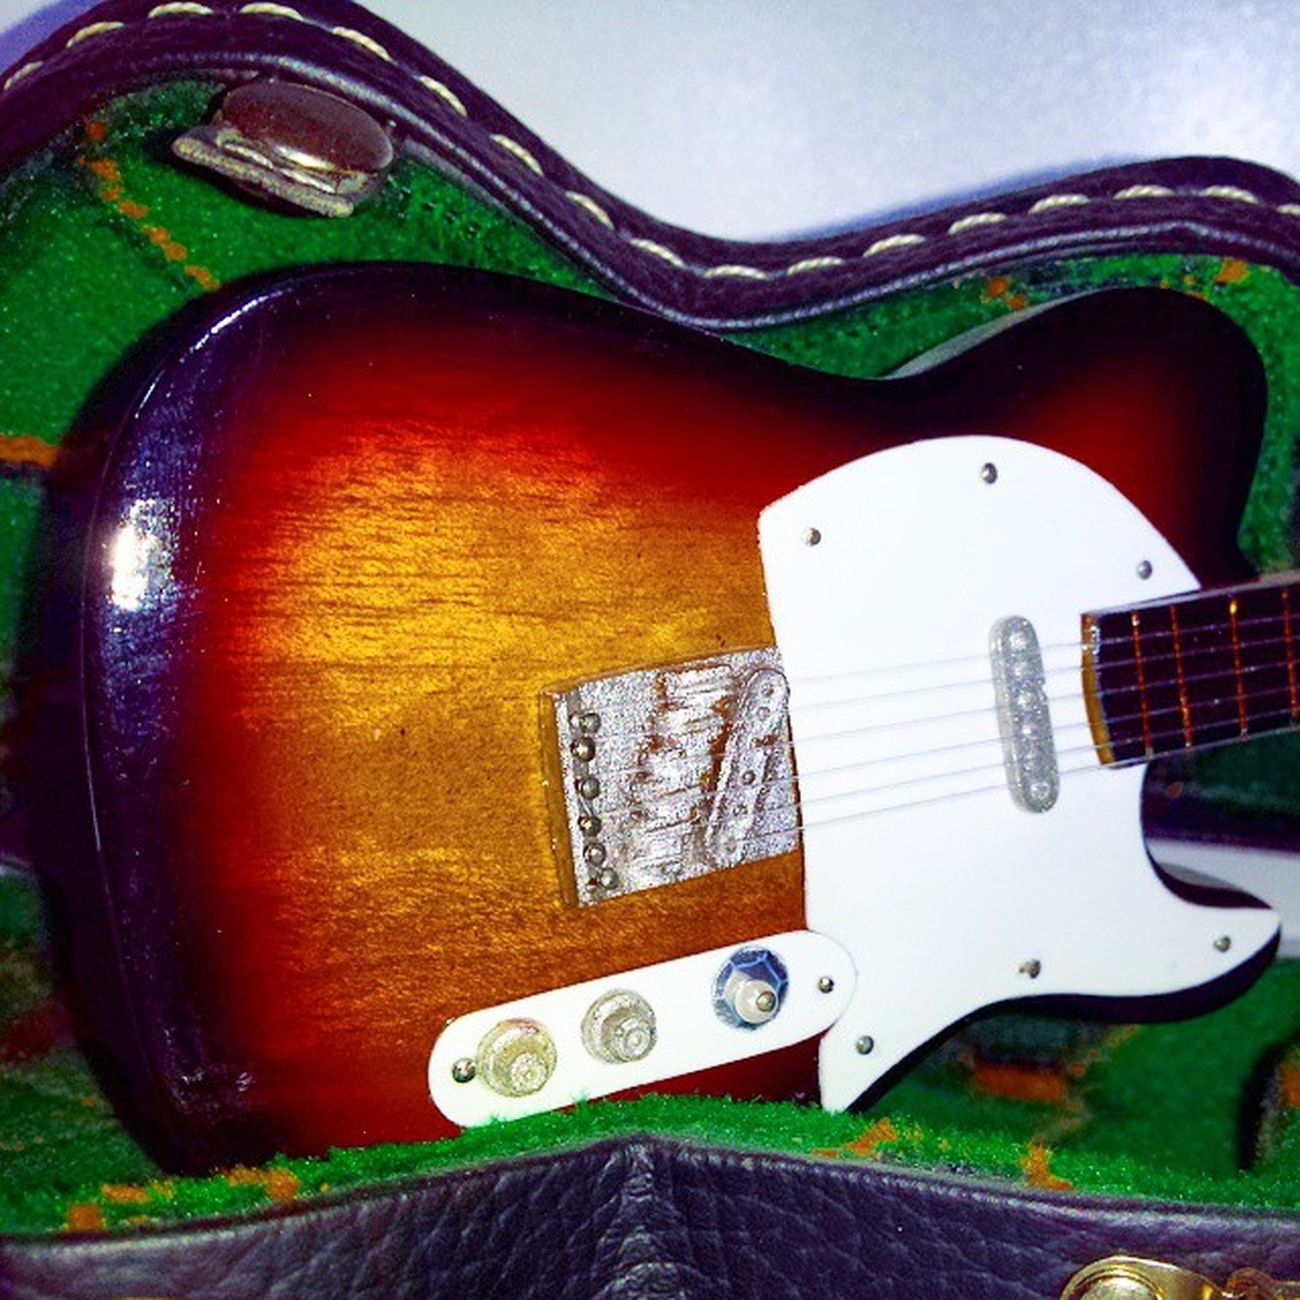 Guitarraelectrica Guitarradecoracion Guitarra Decoracion Maleta Verde Negro Madera Blanco Cuerdas